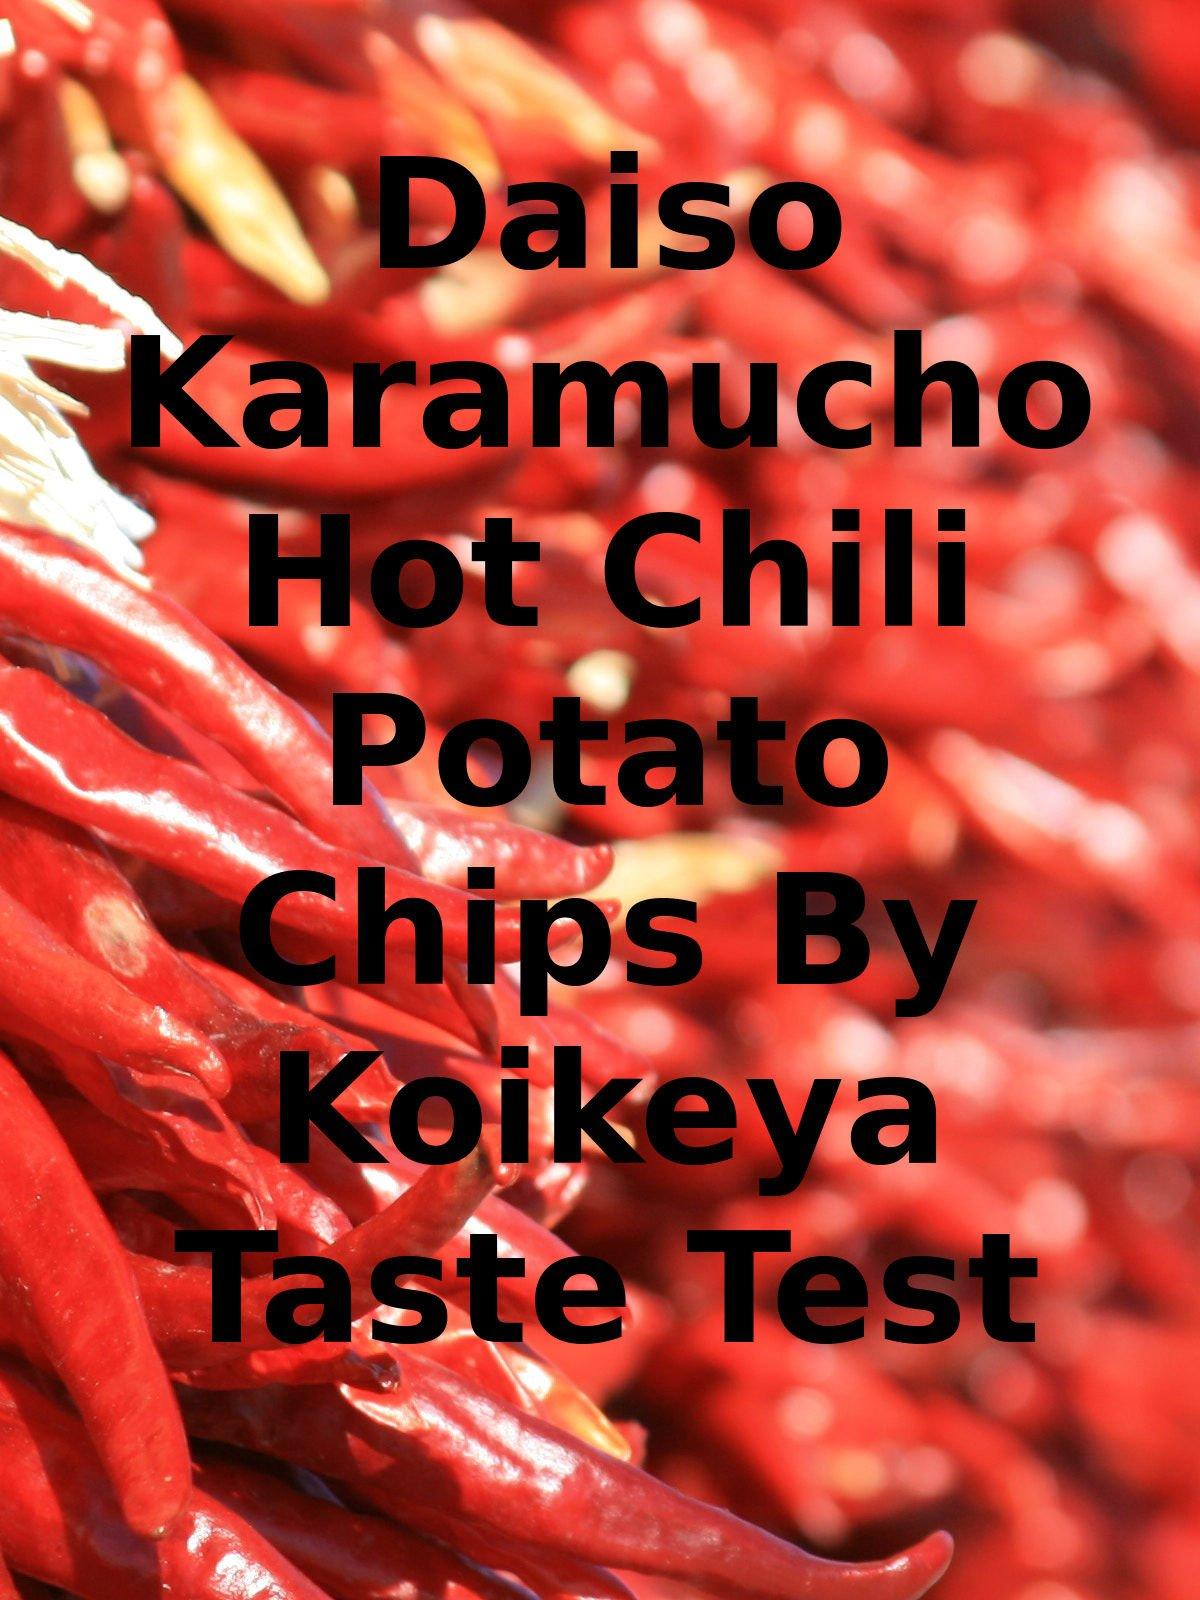 Review: Daiso Karamucho Hot Chili Potato Chips By Koikeya Taste Test